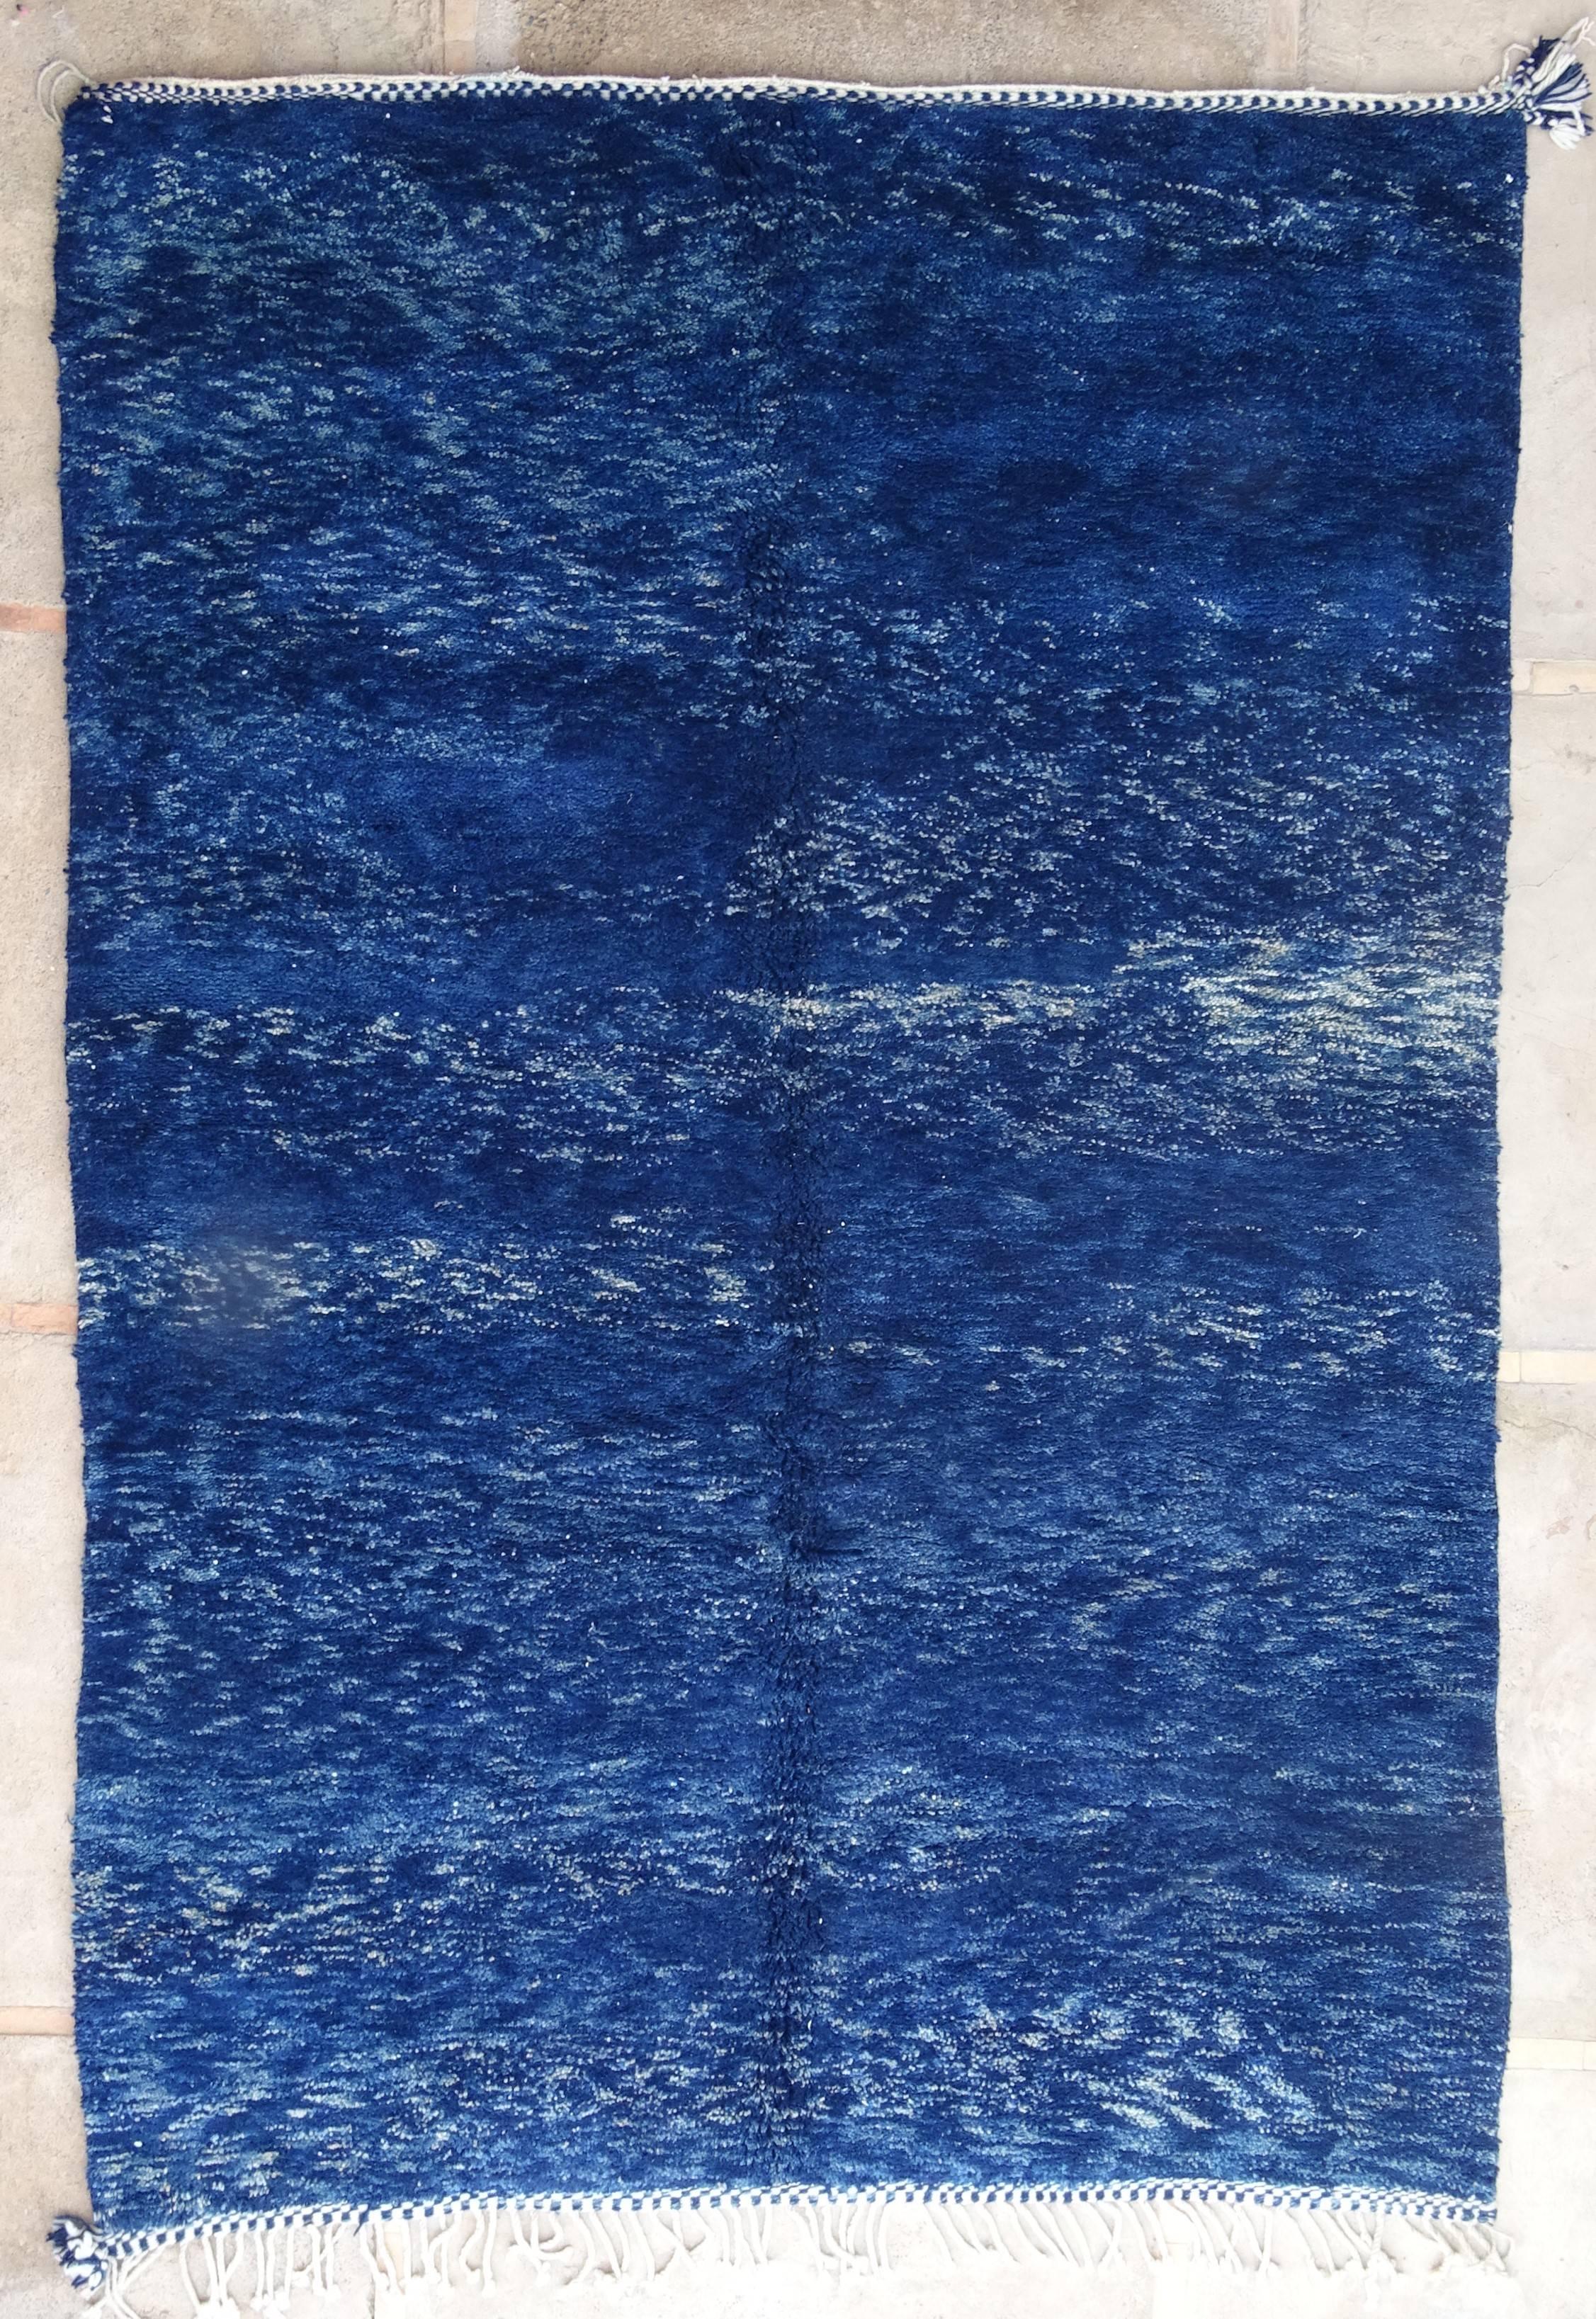 WOOL Rugs - BENI OURAIN MODERN RUGS moroccan rugs MR43029